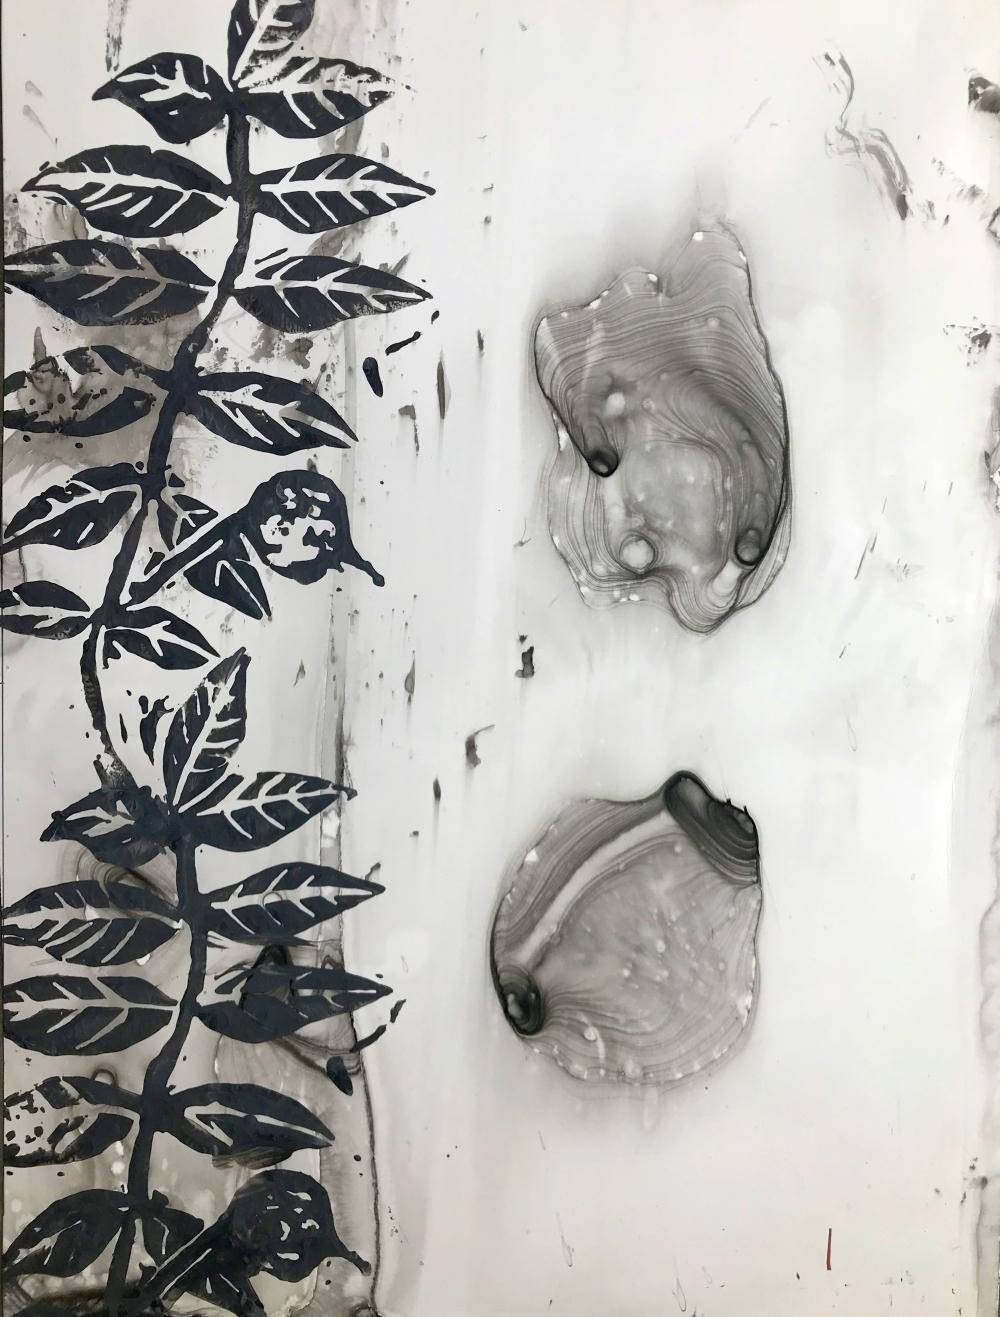 Floral 51 - Cynthia Yatchman